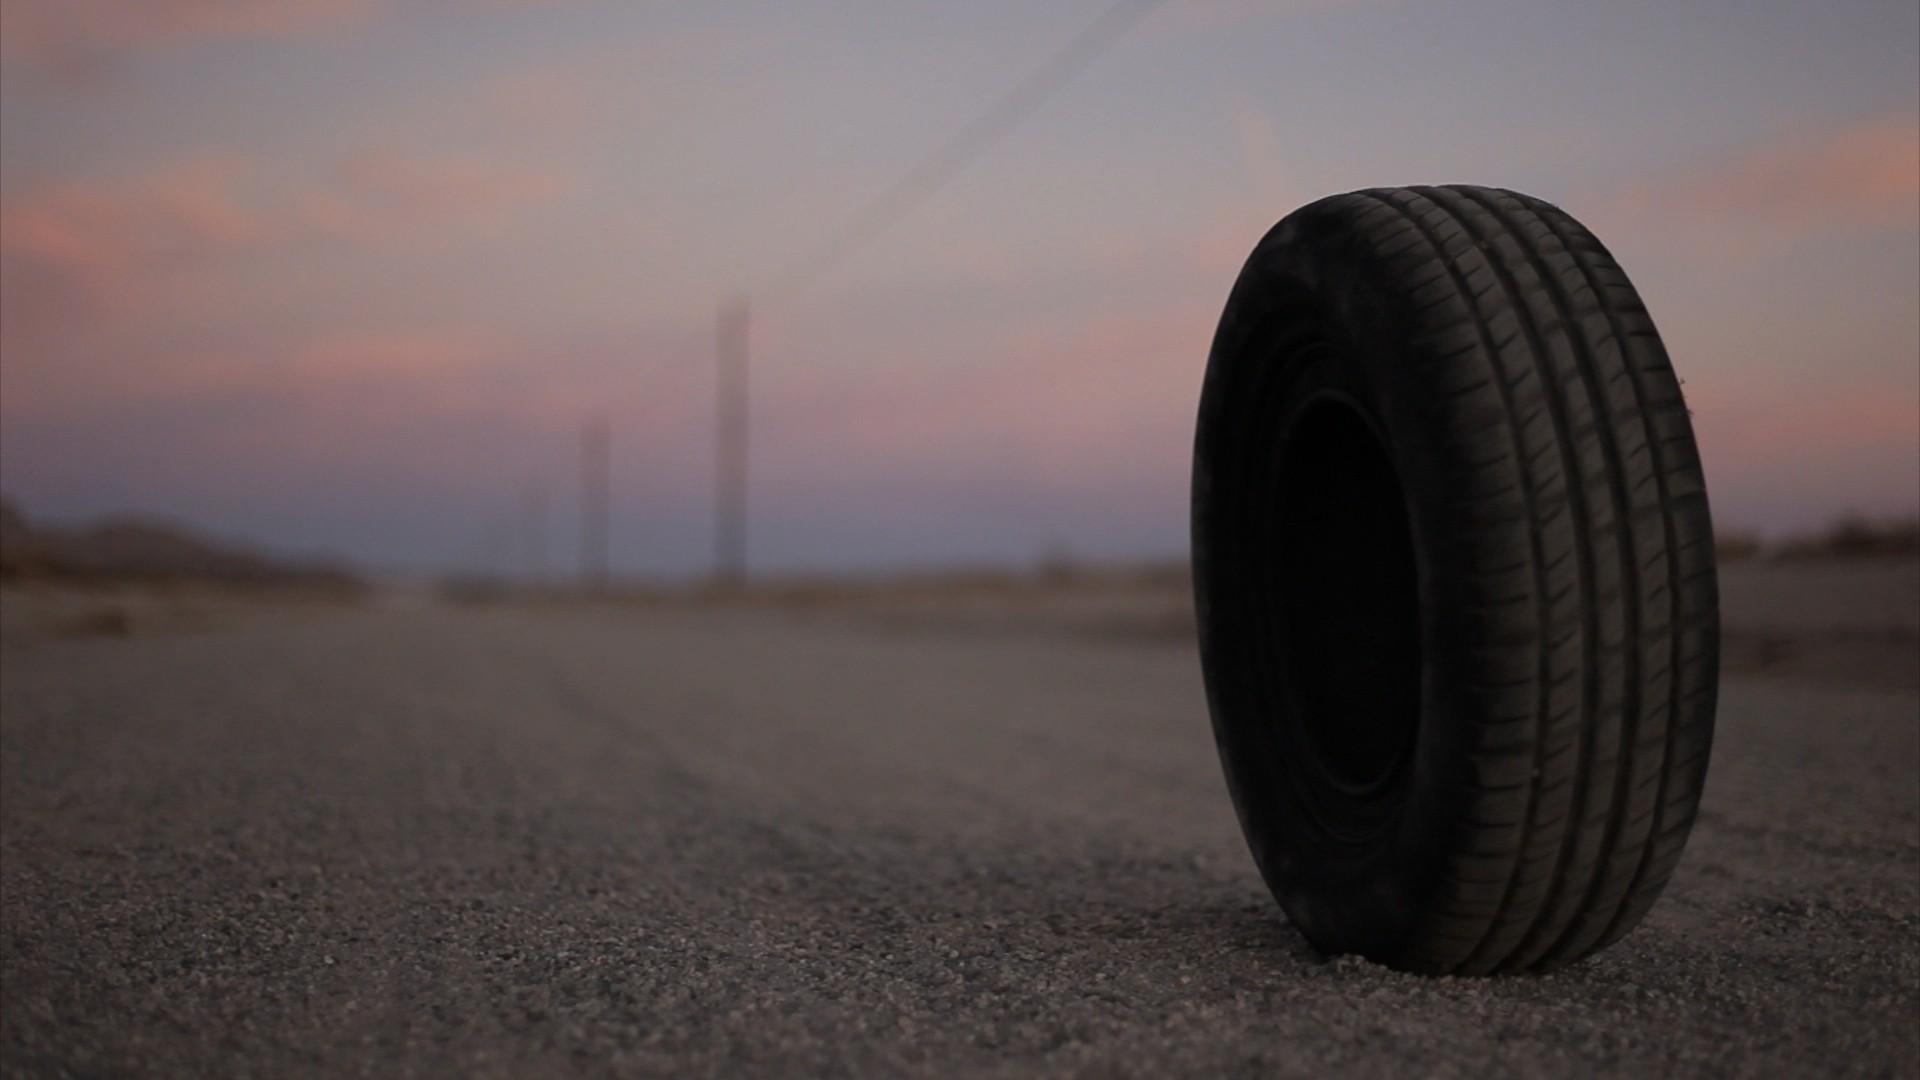 Cars rubber macro wheel Tyres wallpaper 1920x1080 218609 1920x1080